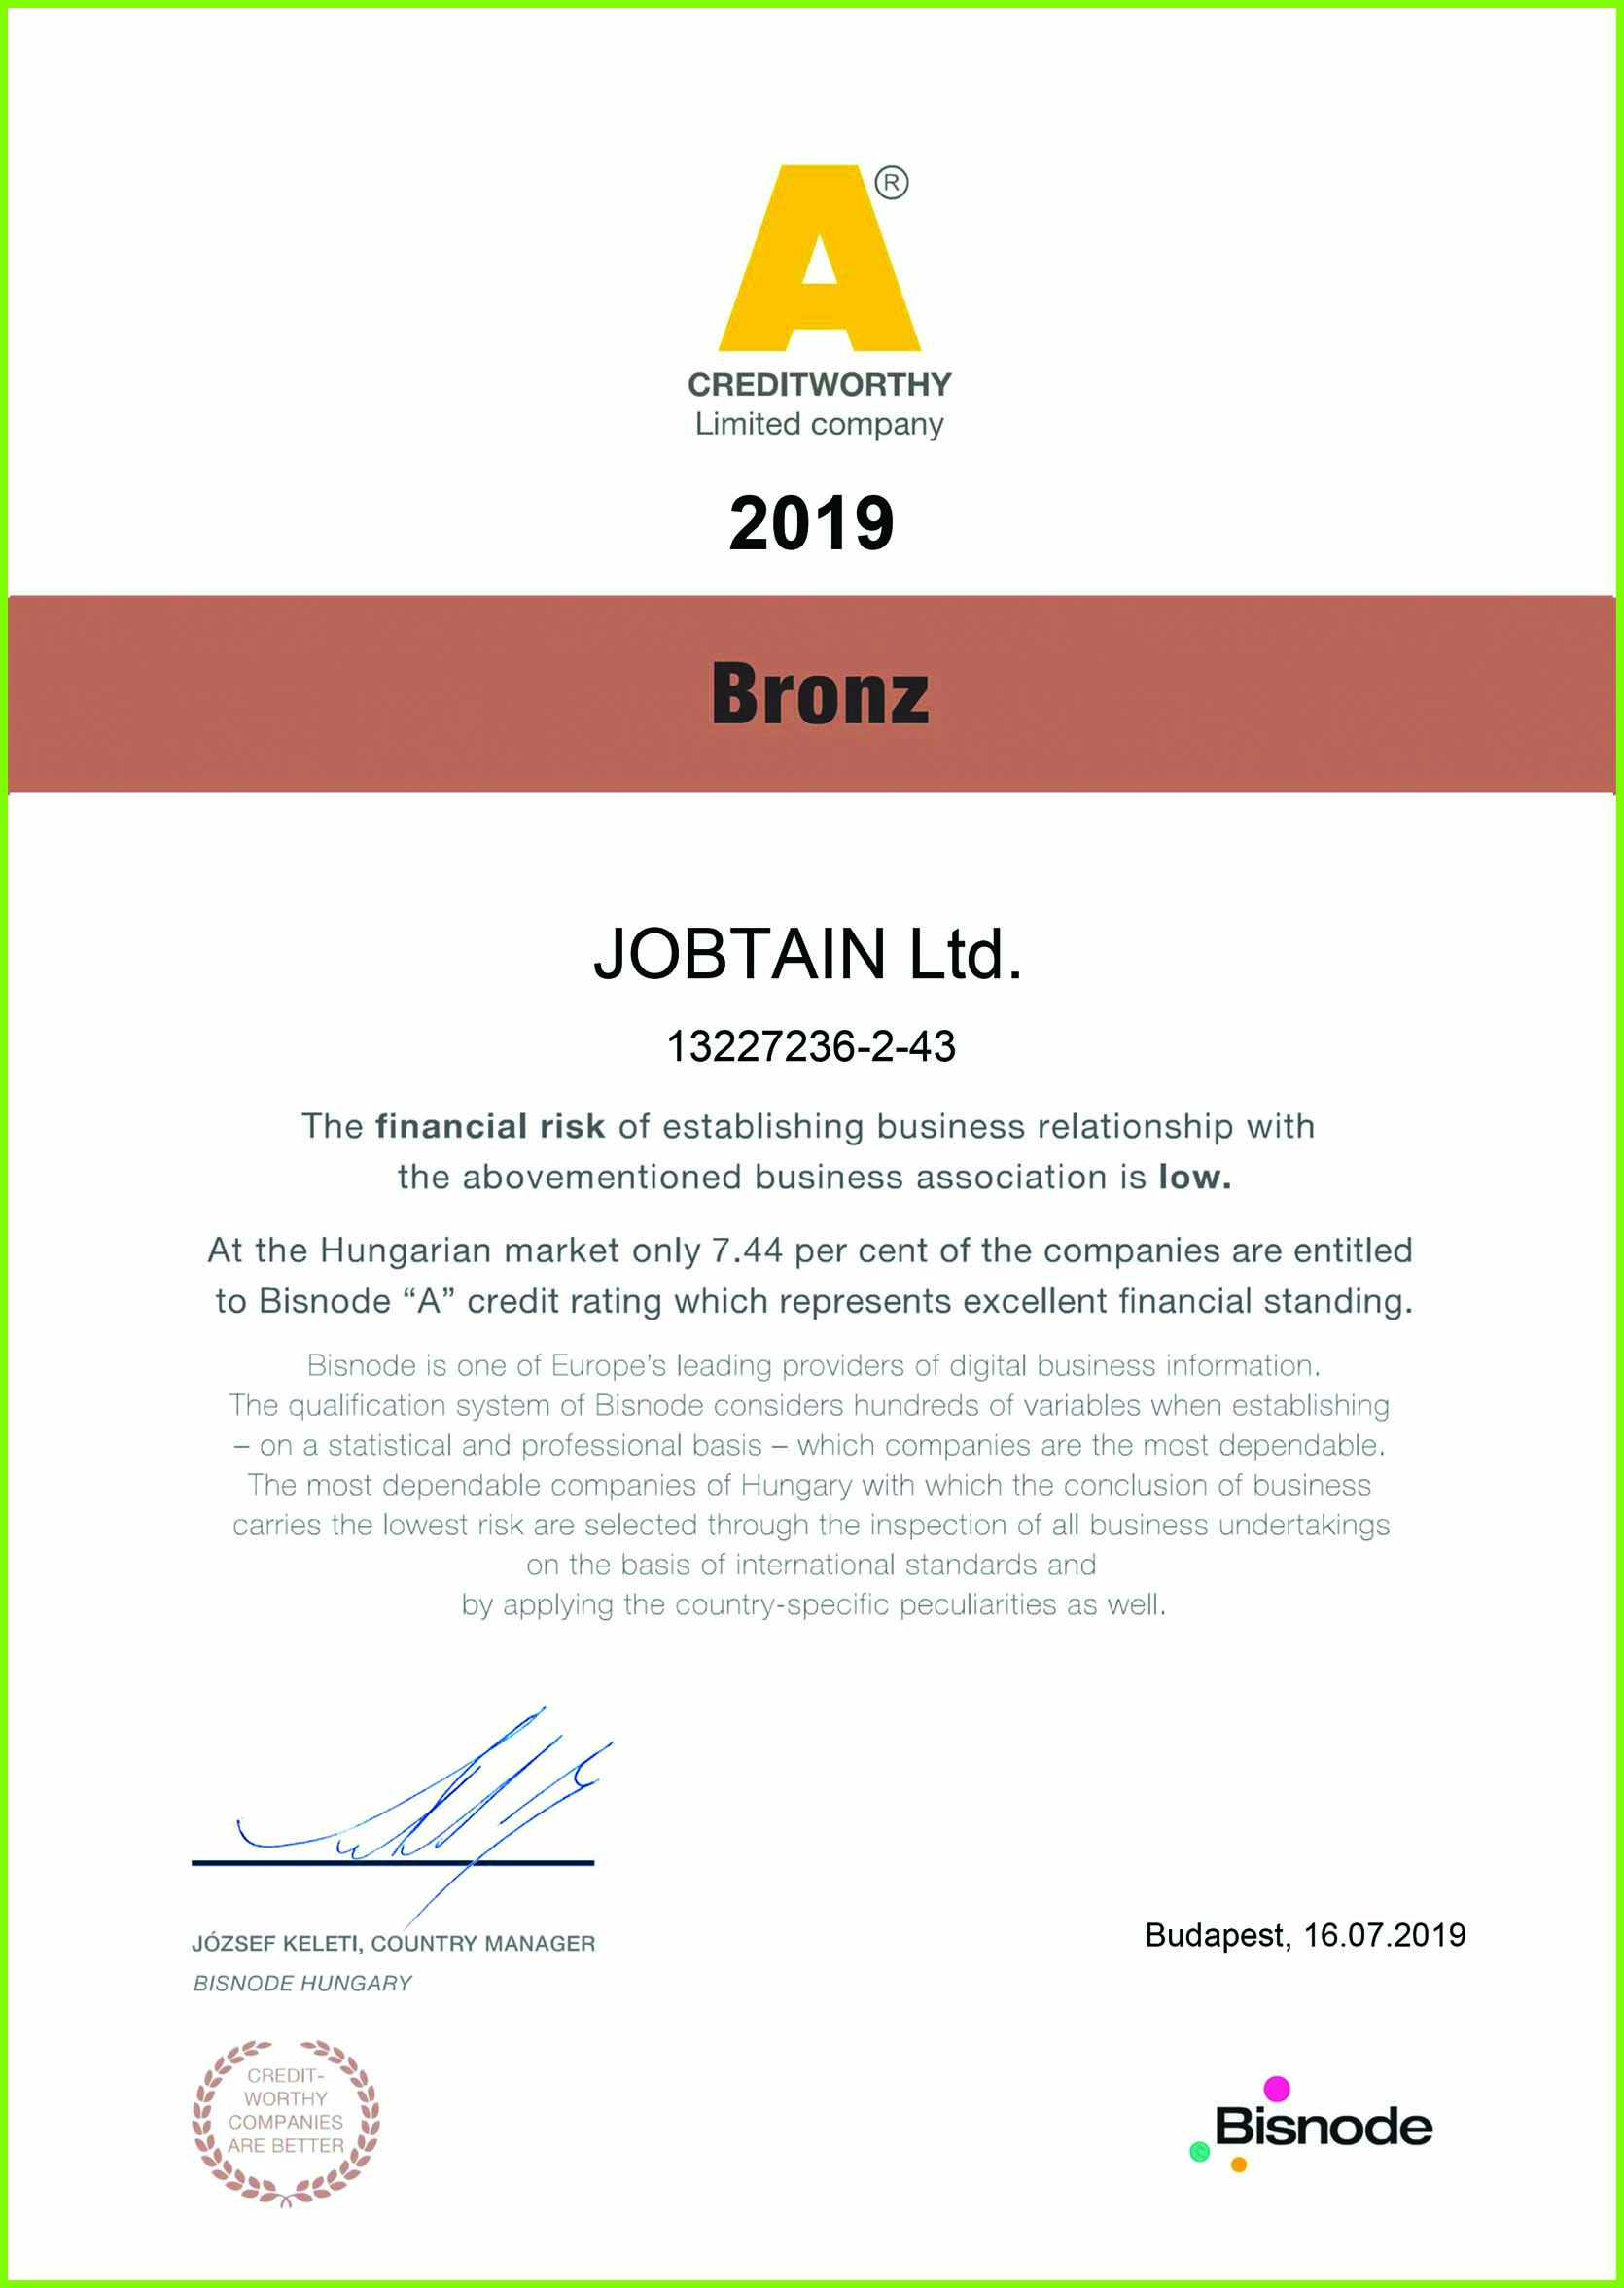 Jobtain's Credibility rating